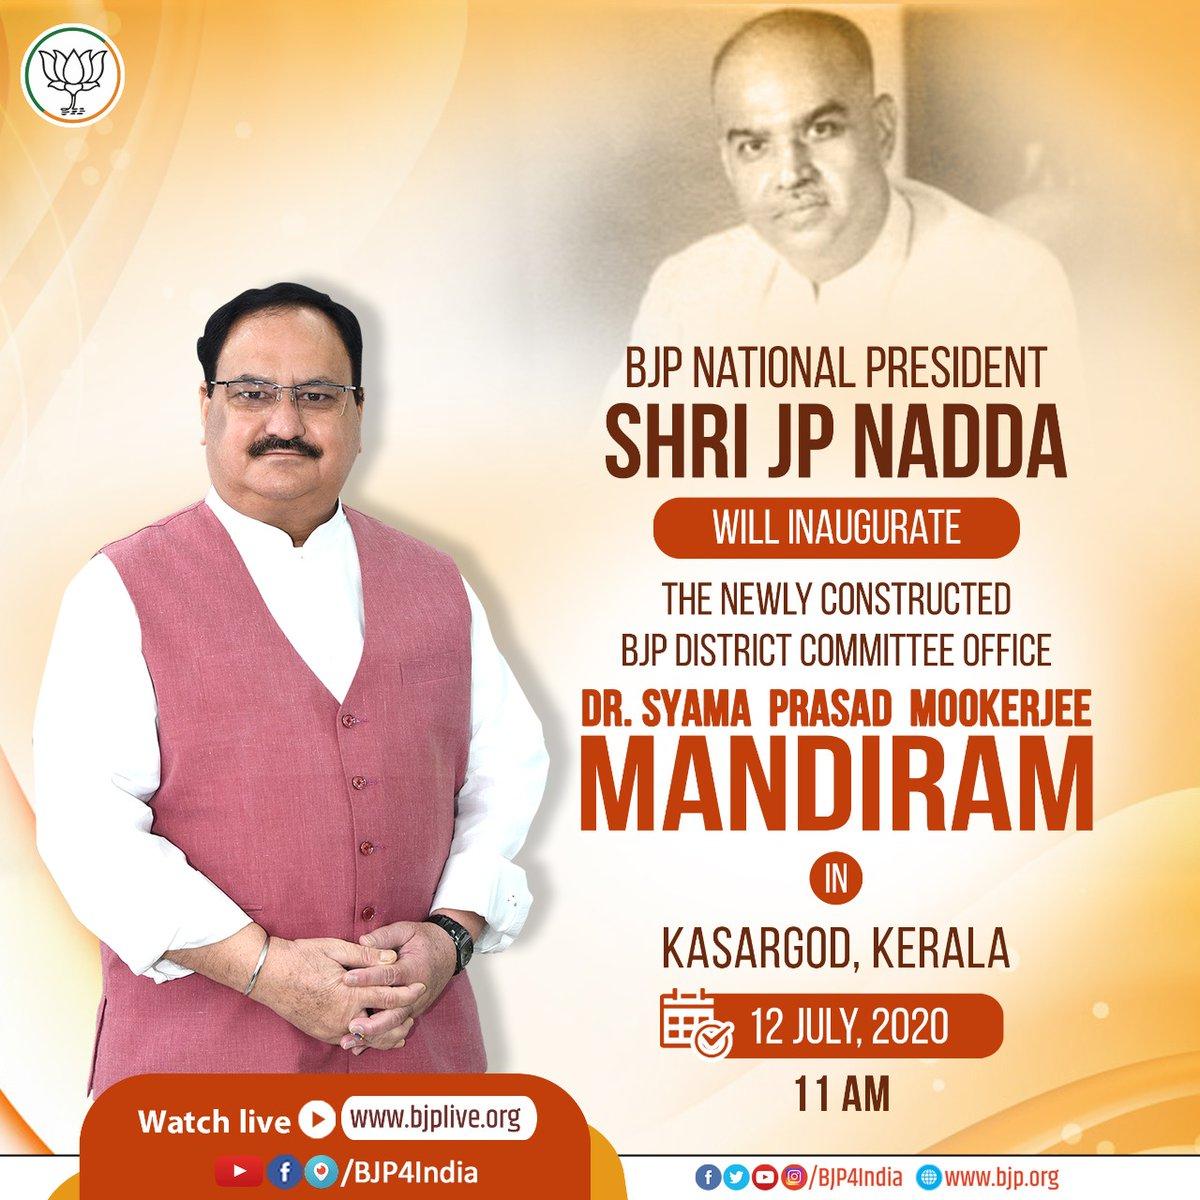 BJP National President Shri @JPNadda will inaugurate the newly constructed BJP District Committee office building 'Dr. Syama Prasad Mookerjee Mandiram' in Kasaragod, Kerala tomorrow.  Watch live on all BJP's social media platforms. https://t.co/cjxahtLDnL